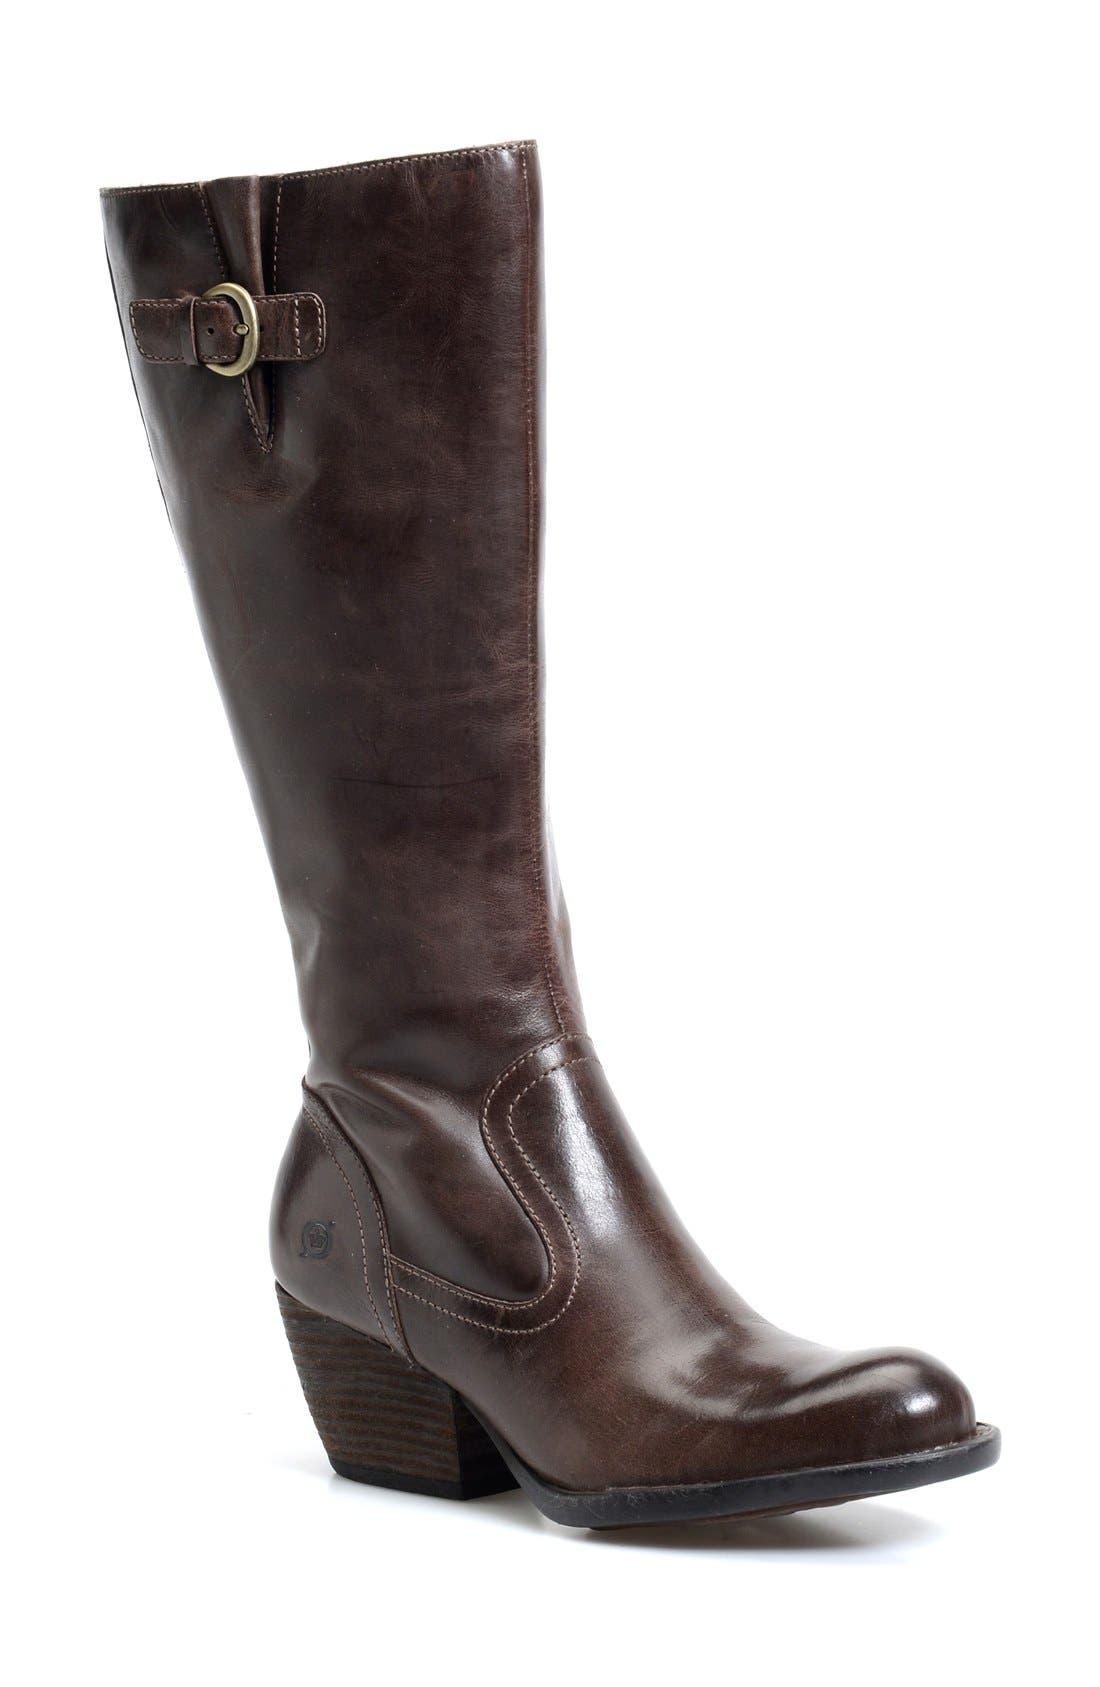 Alternate Image 1 Selected - Børn 'Freeda' Boot (Women)